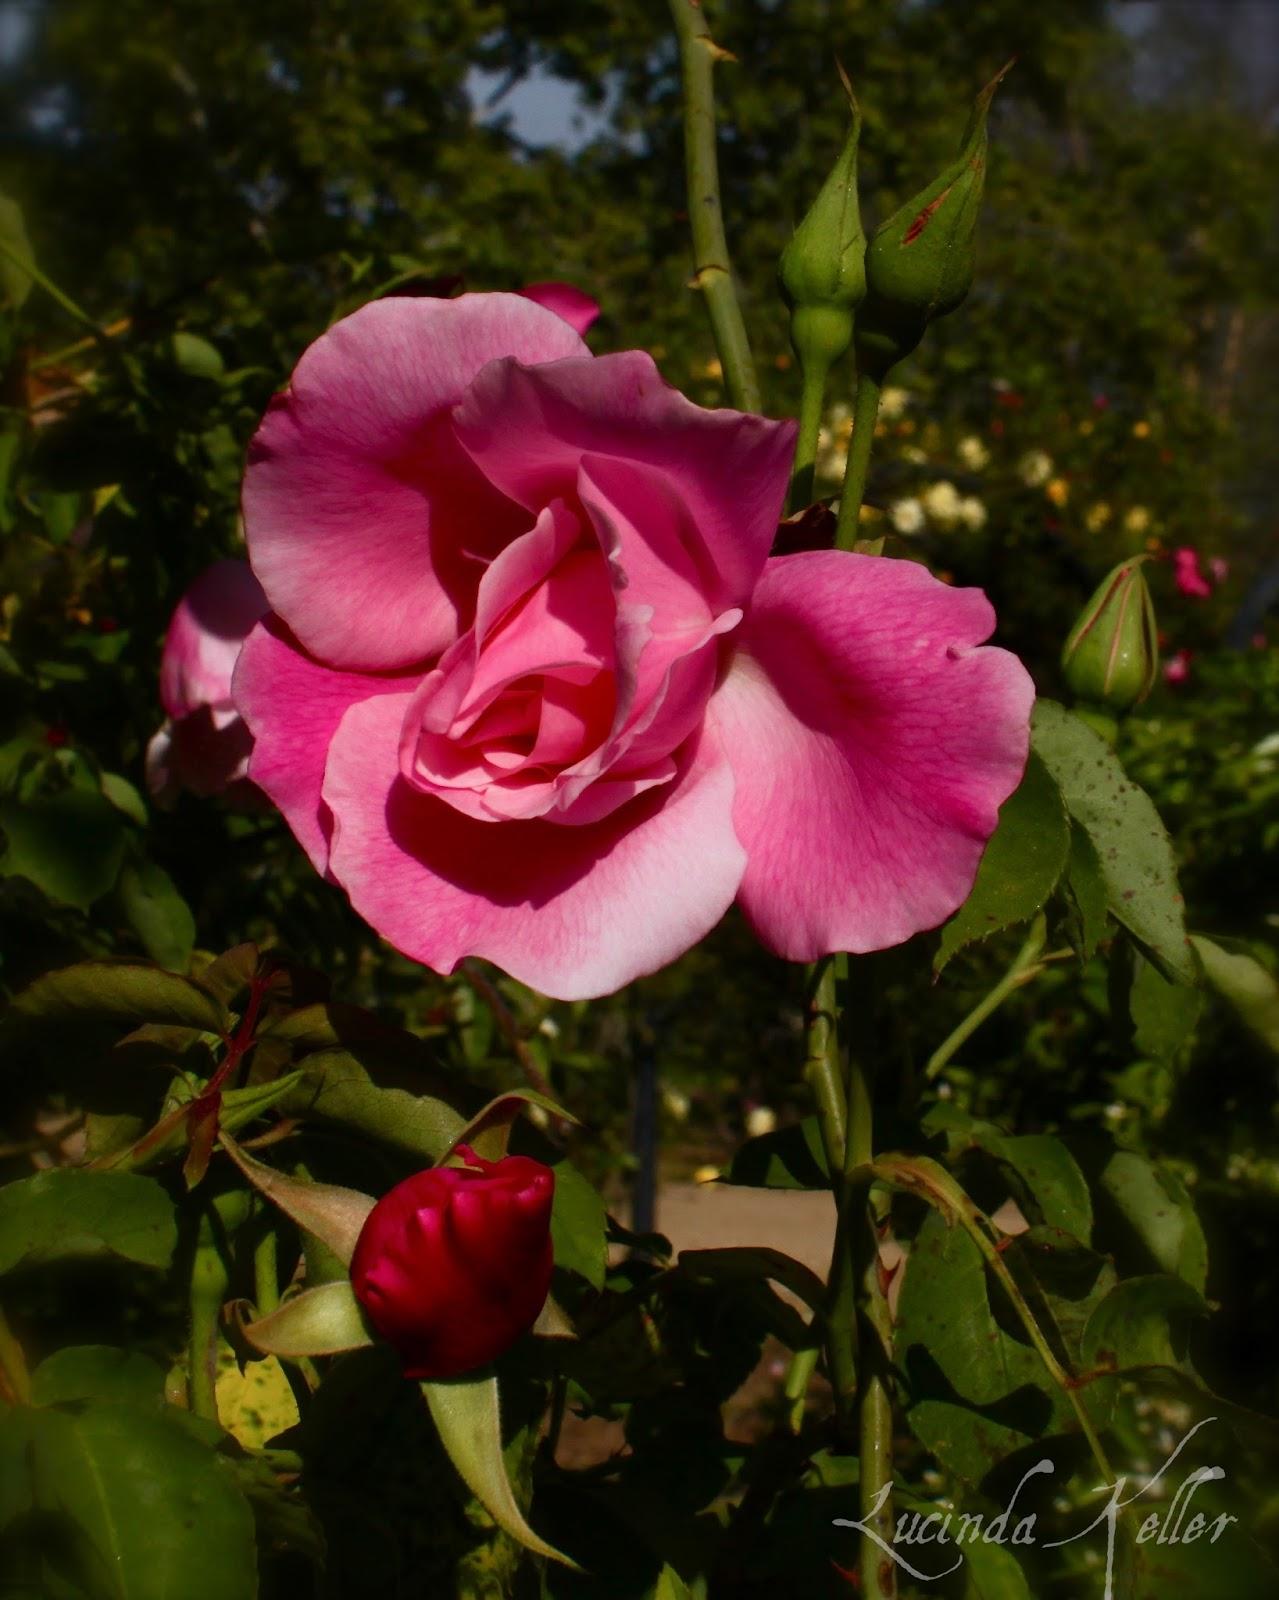 Cobalt Violet Spectacular Spring at Descanso Gardens Part 3 Waltz of the